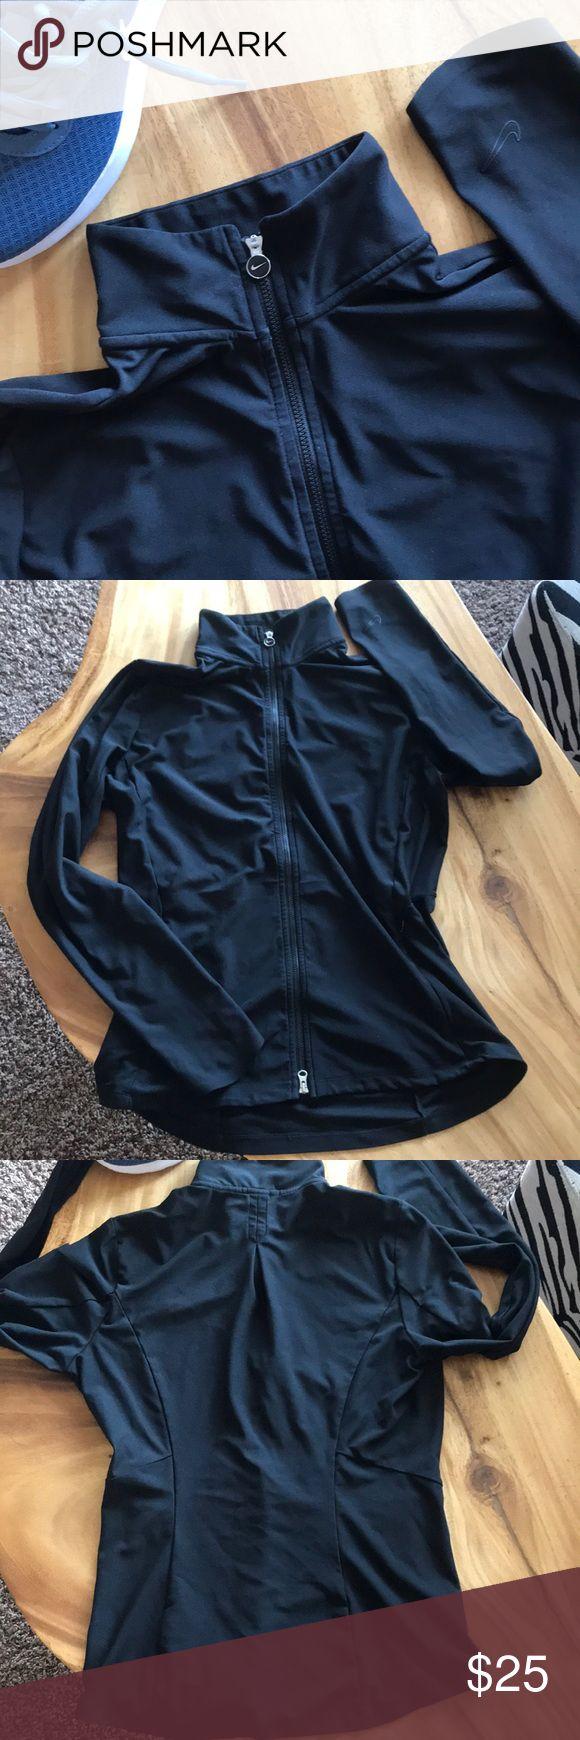 DRI-FIT golf jacket Excellent condition, sleek, full zip jacket by Nike. Nike Jackets & Coats